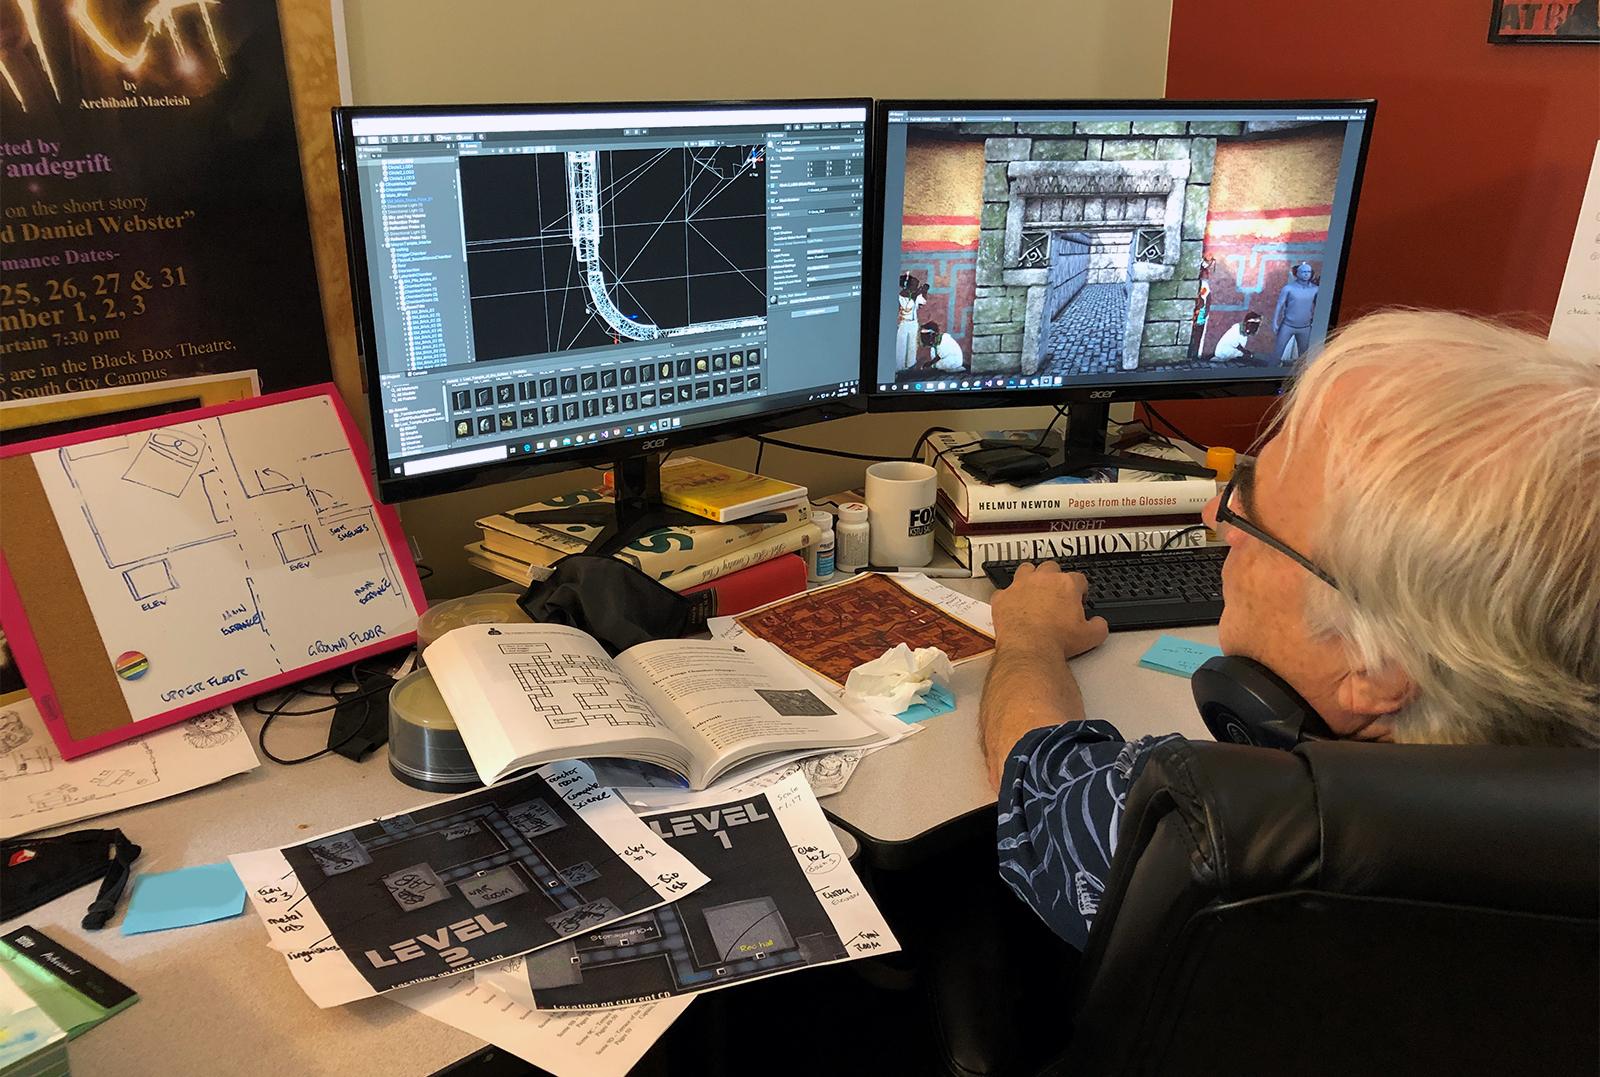 Doug Vandegrift working on level design.